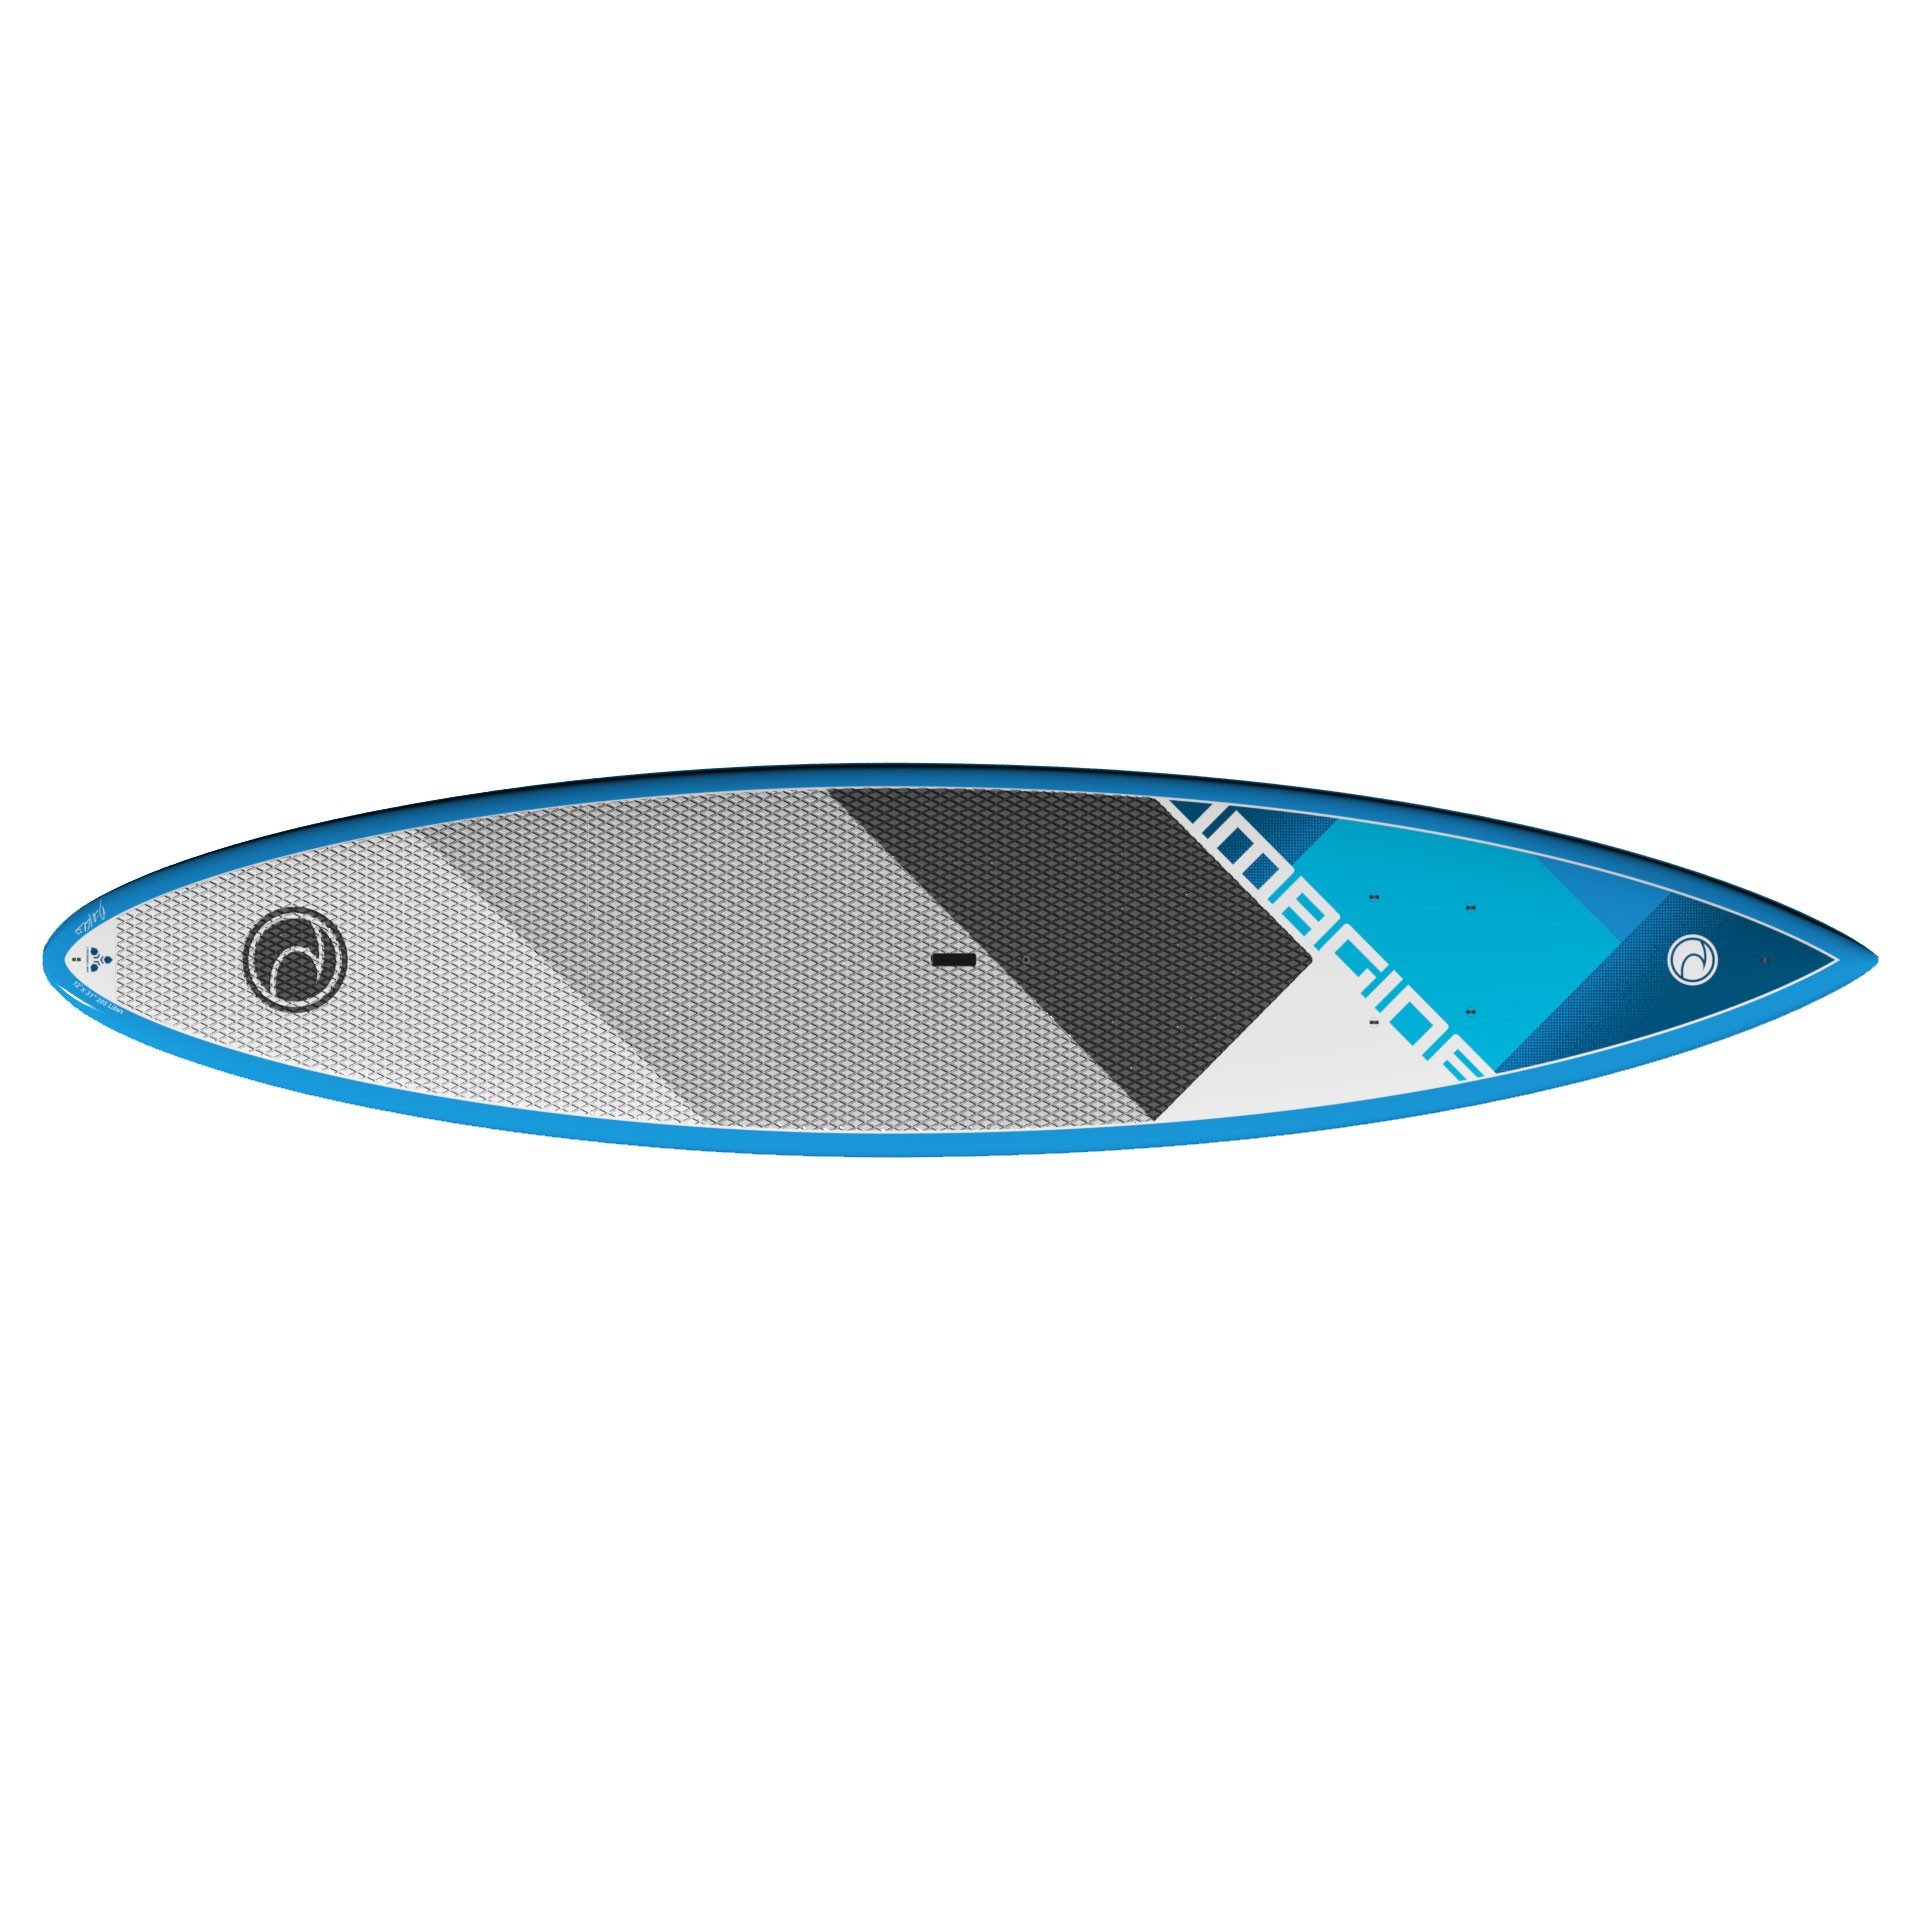 Imagine Crossover Glass Composite SUP